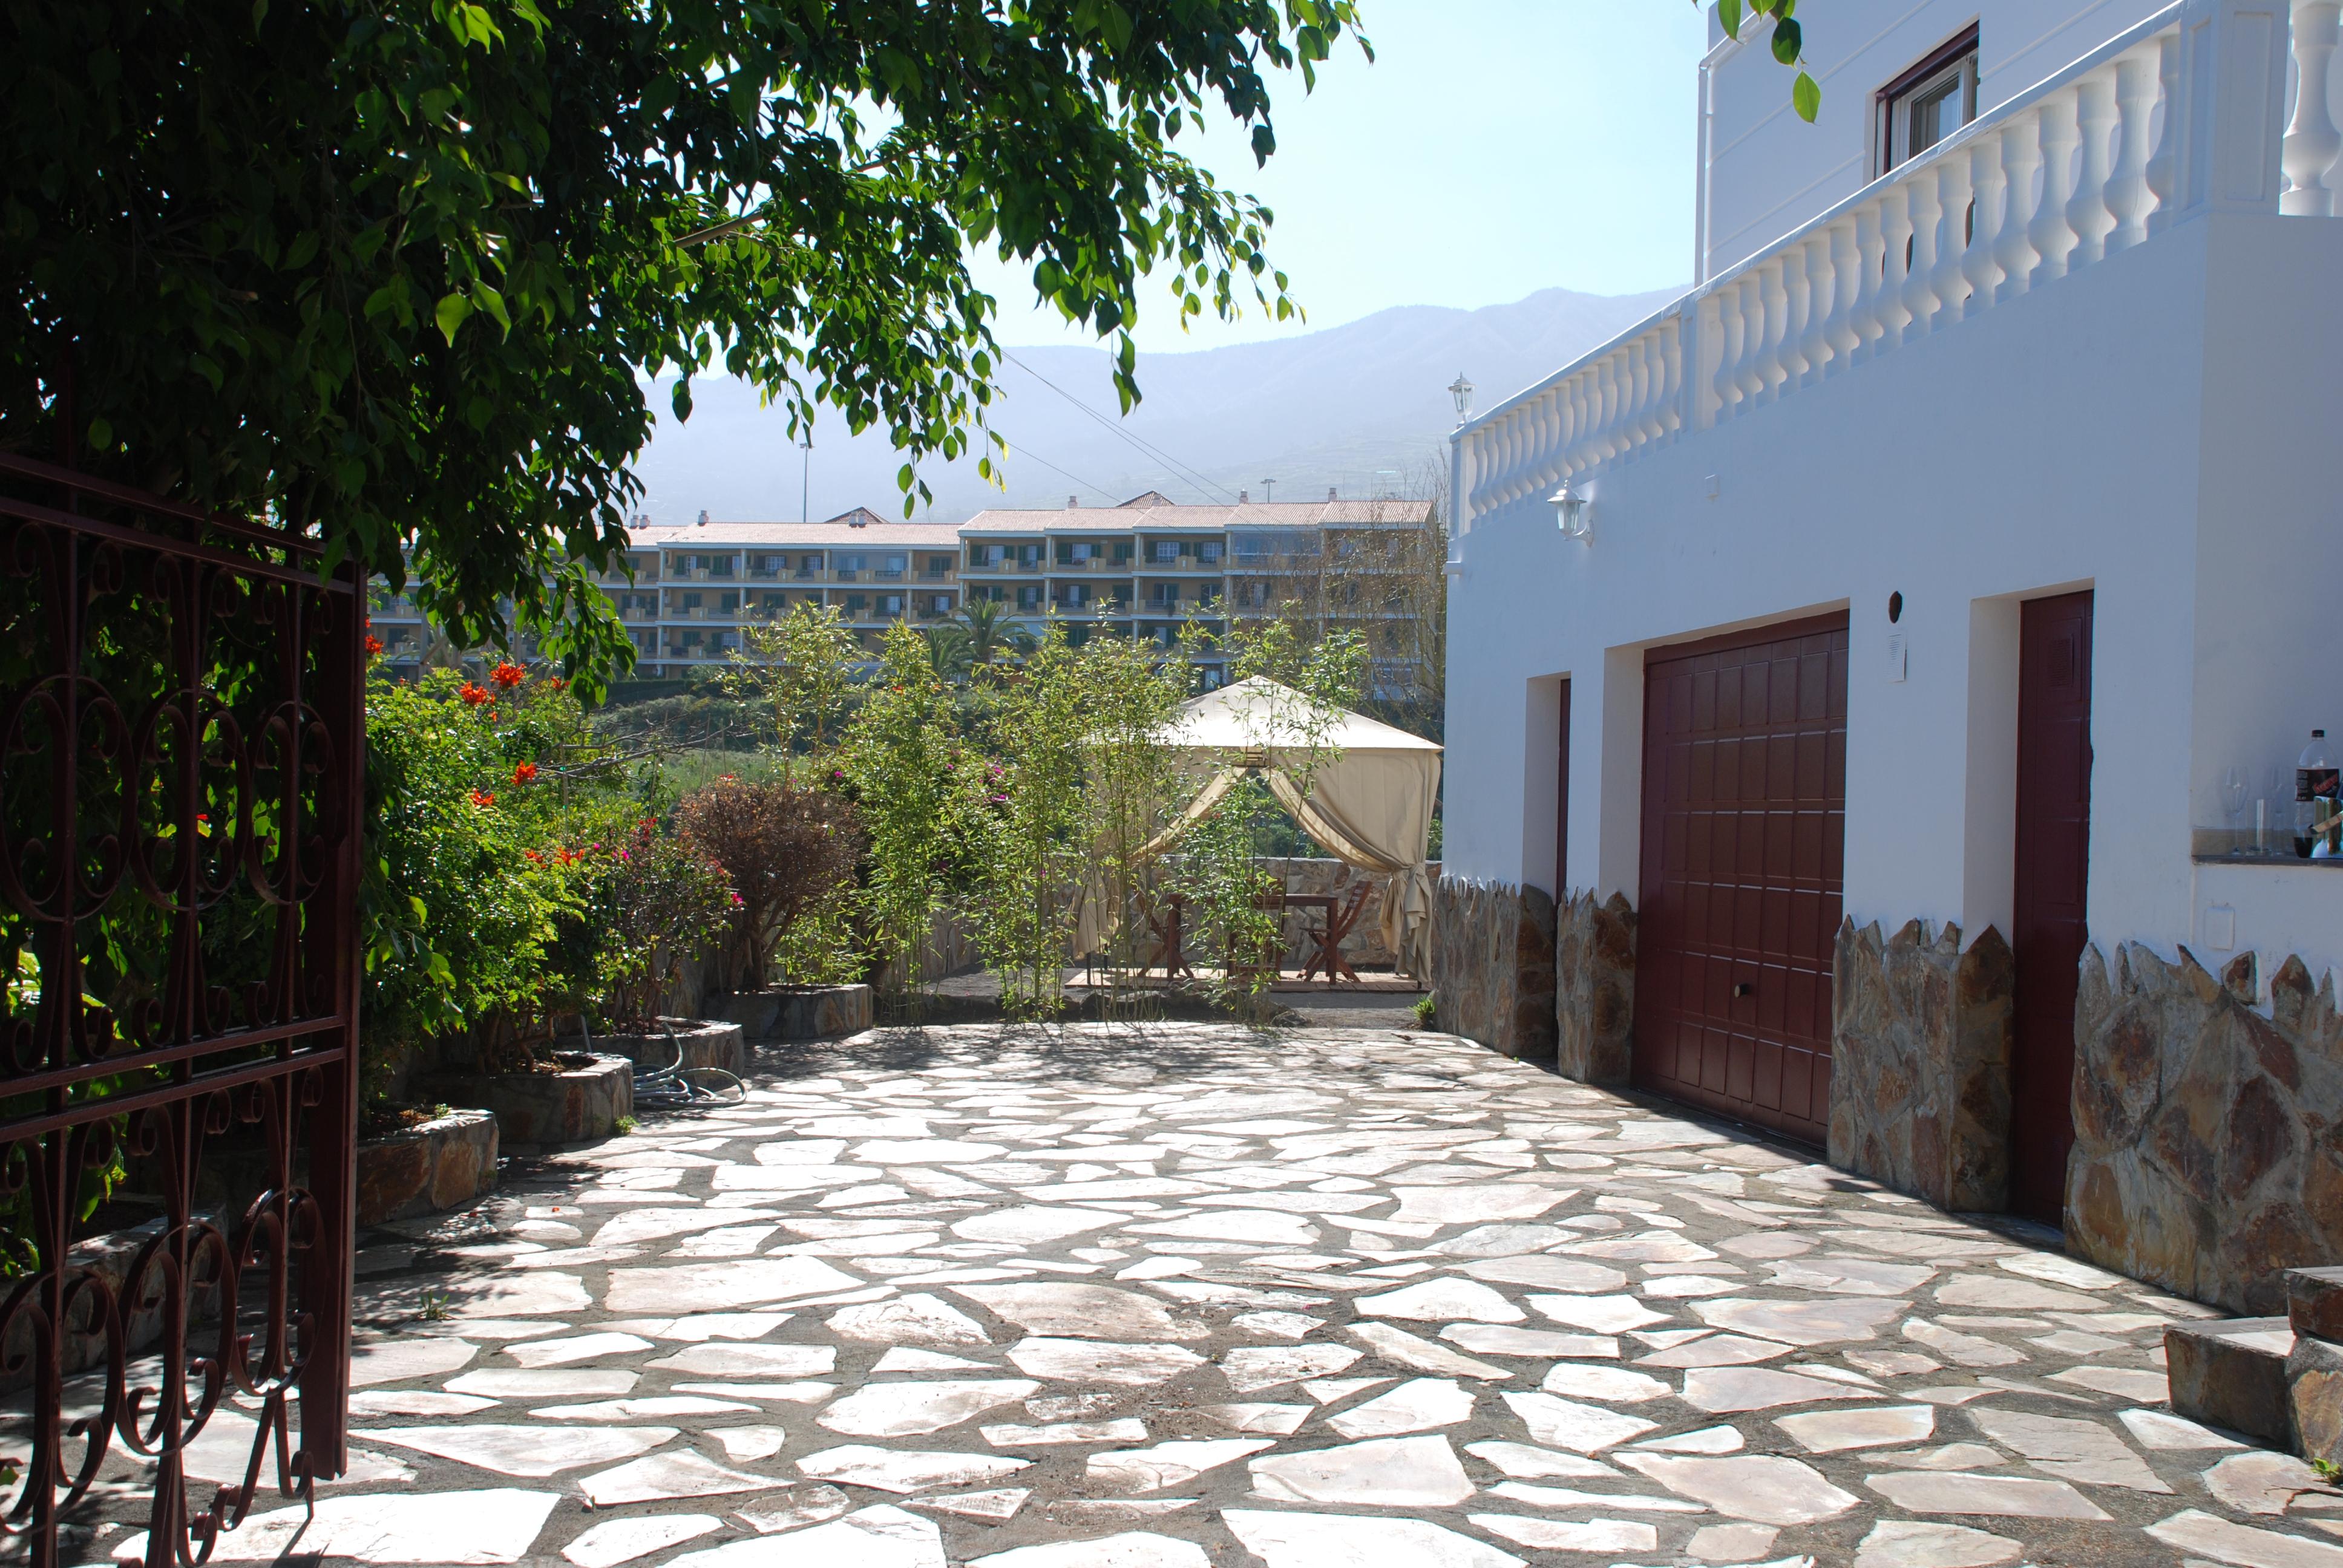 Maison de vacances Villa Vista La Quinta beheizbarer Pool kostenloses WLAN Grill (2124407), Santa Ursula, Ténérife, Iles Canaries, Espagne, image 86